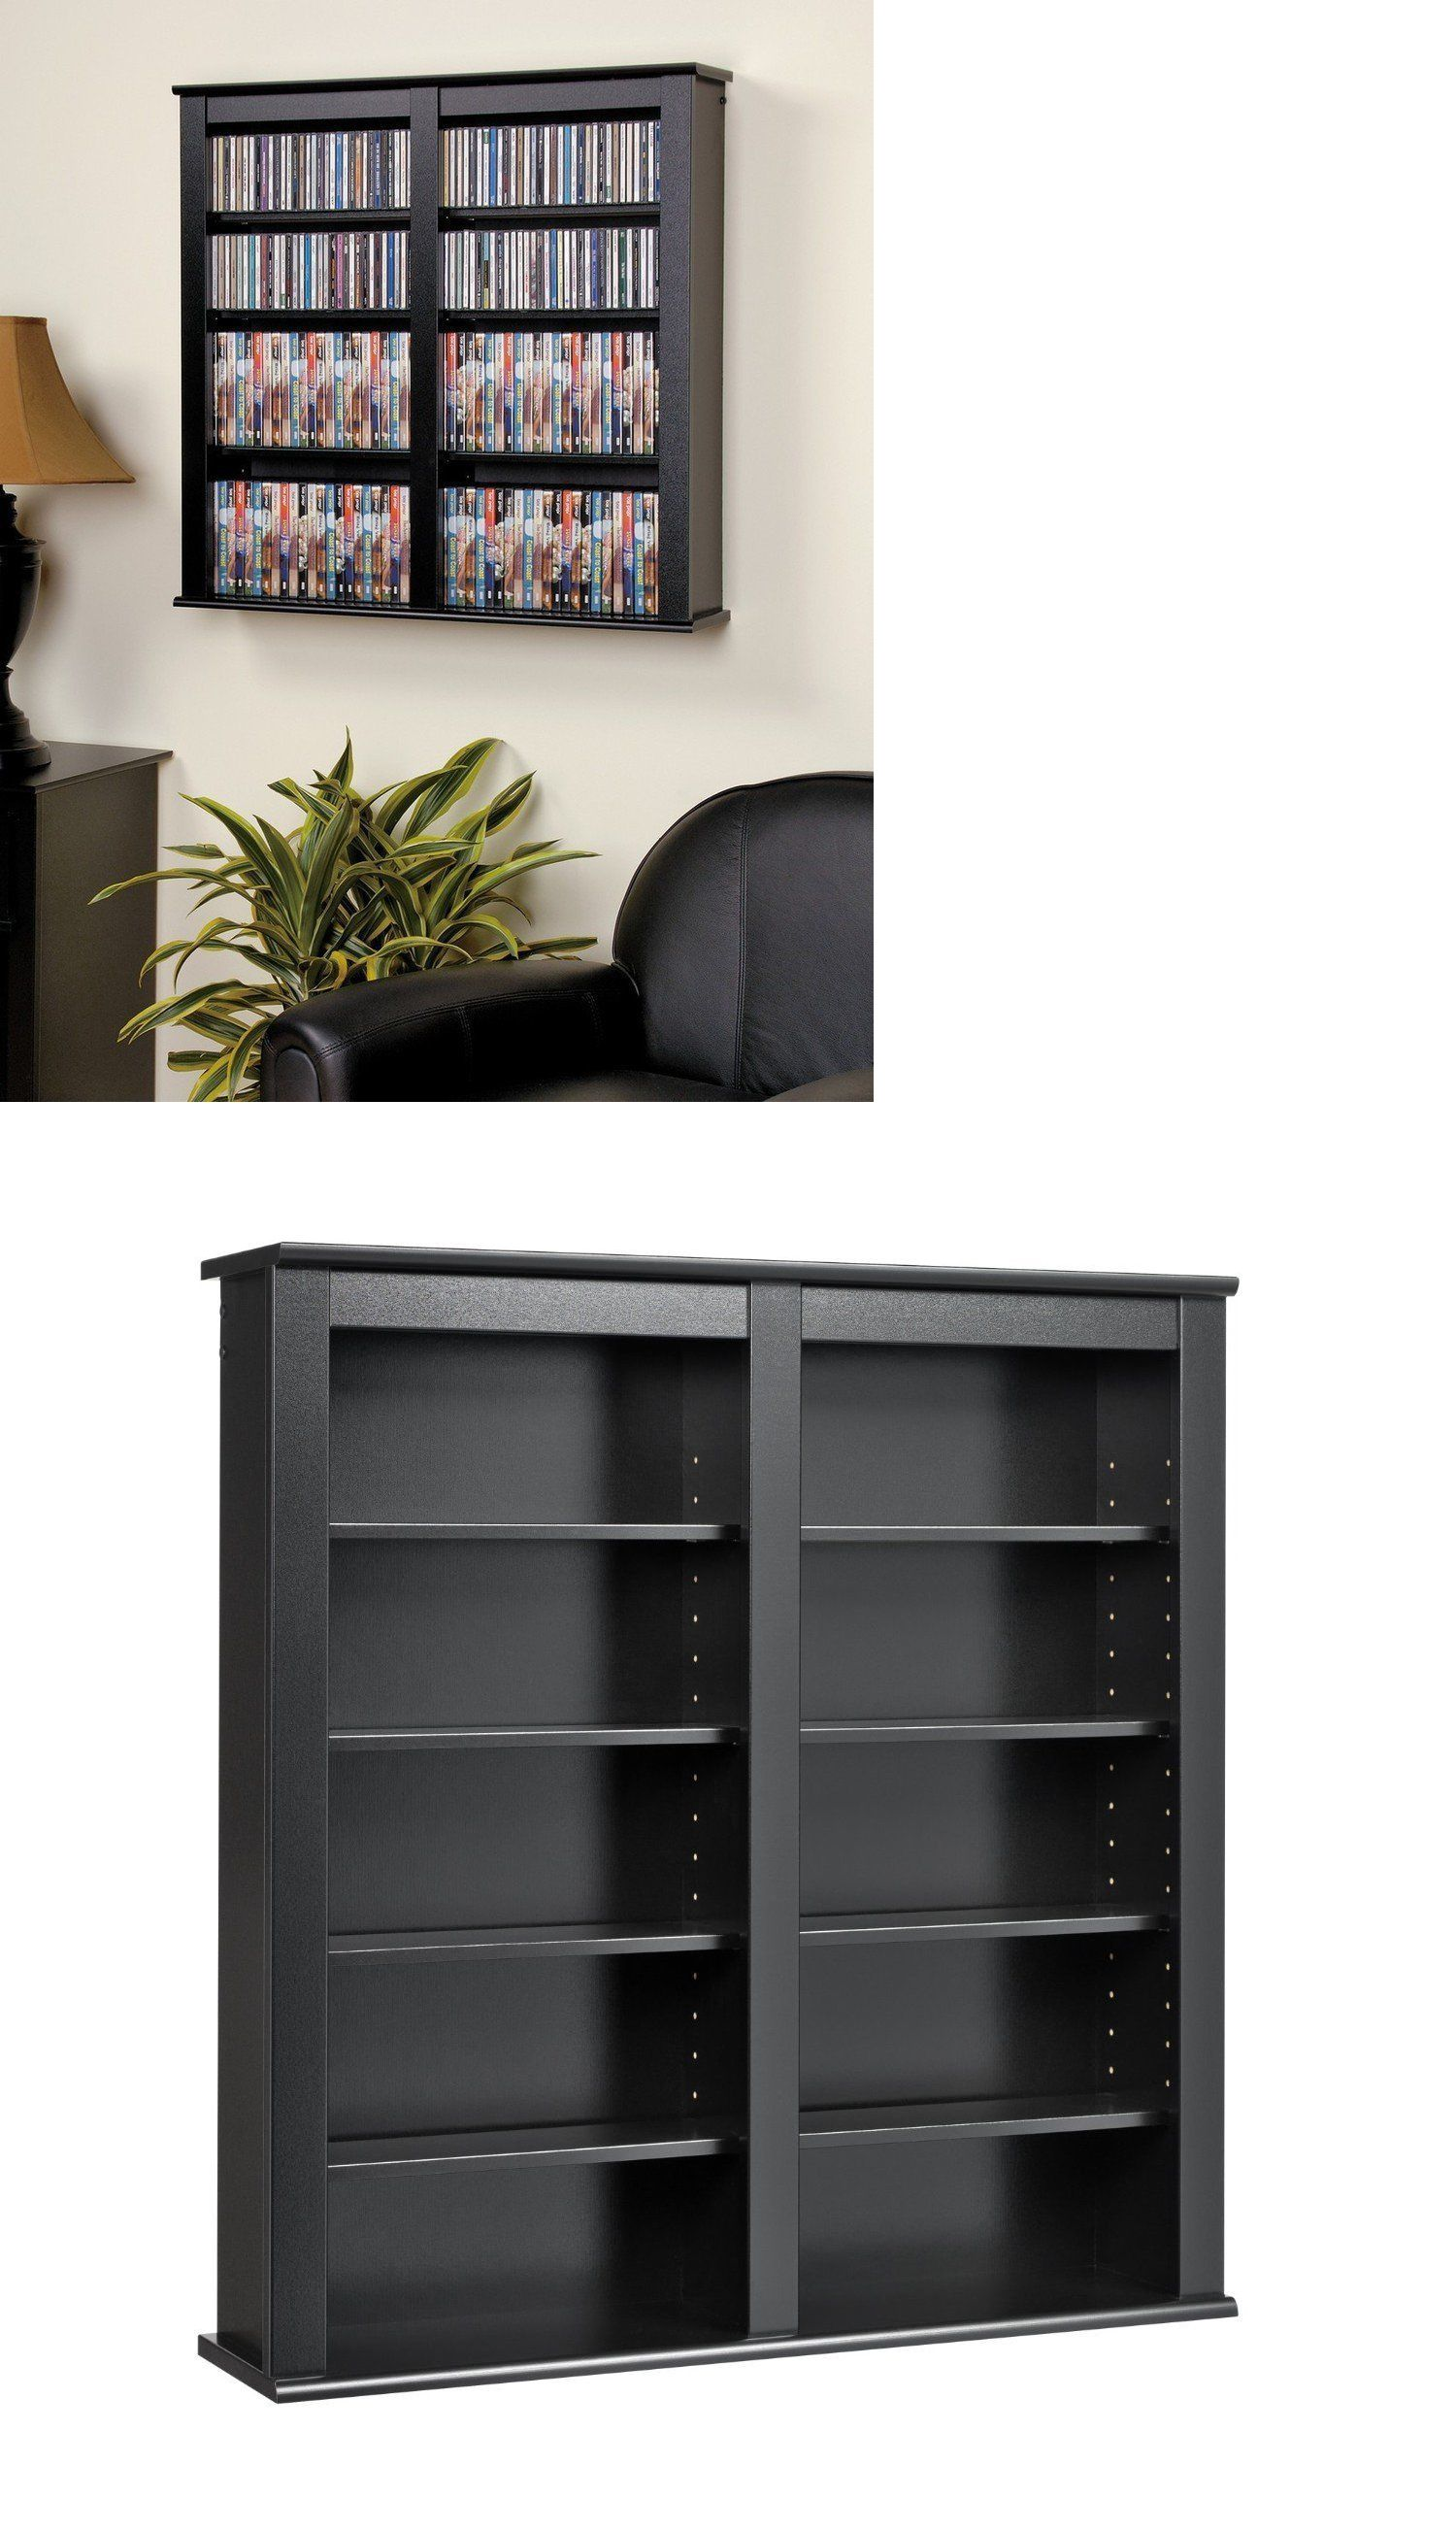 Cd And Video Racks 22653 Black Media Storage Cabinet Wall Hanging Shelf Rack 32 Dvd Display Organizer It Now Only 113 95 On Ebay